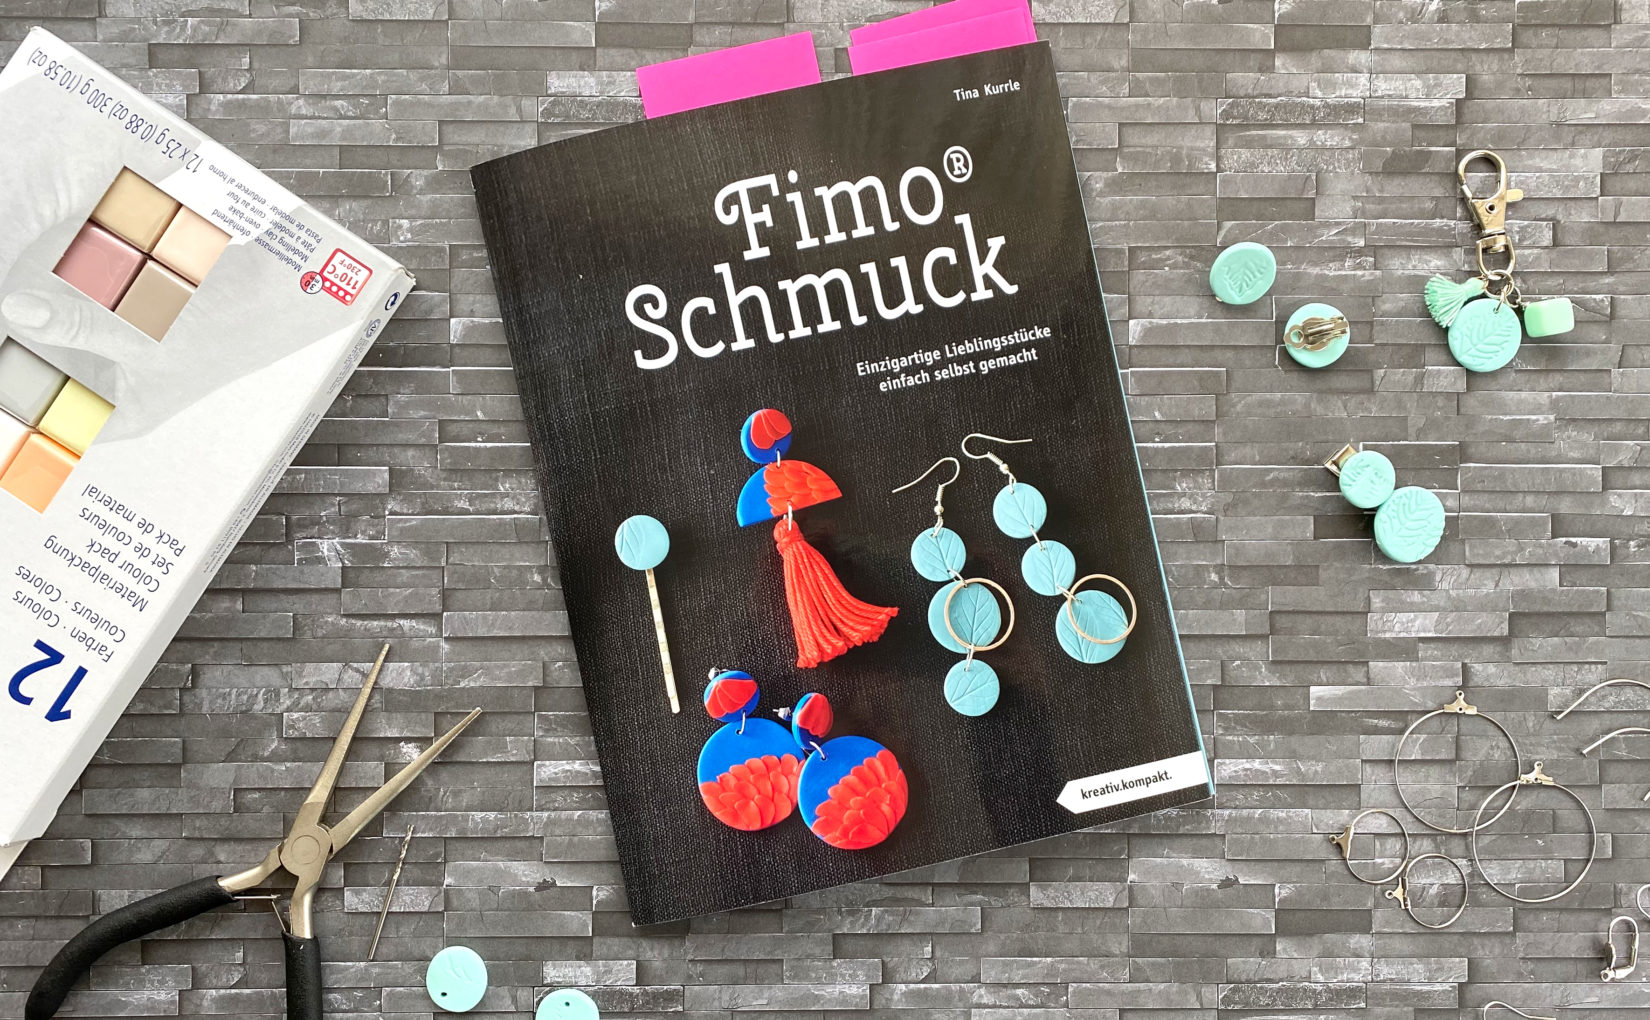 FimoⓇ Schmuck